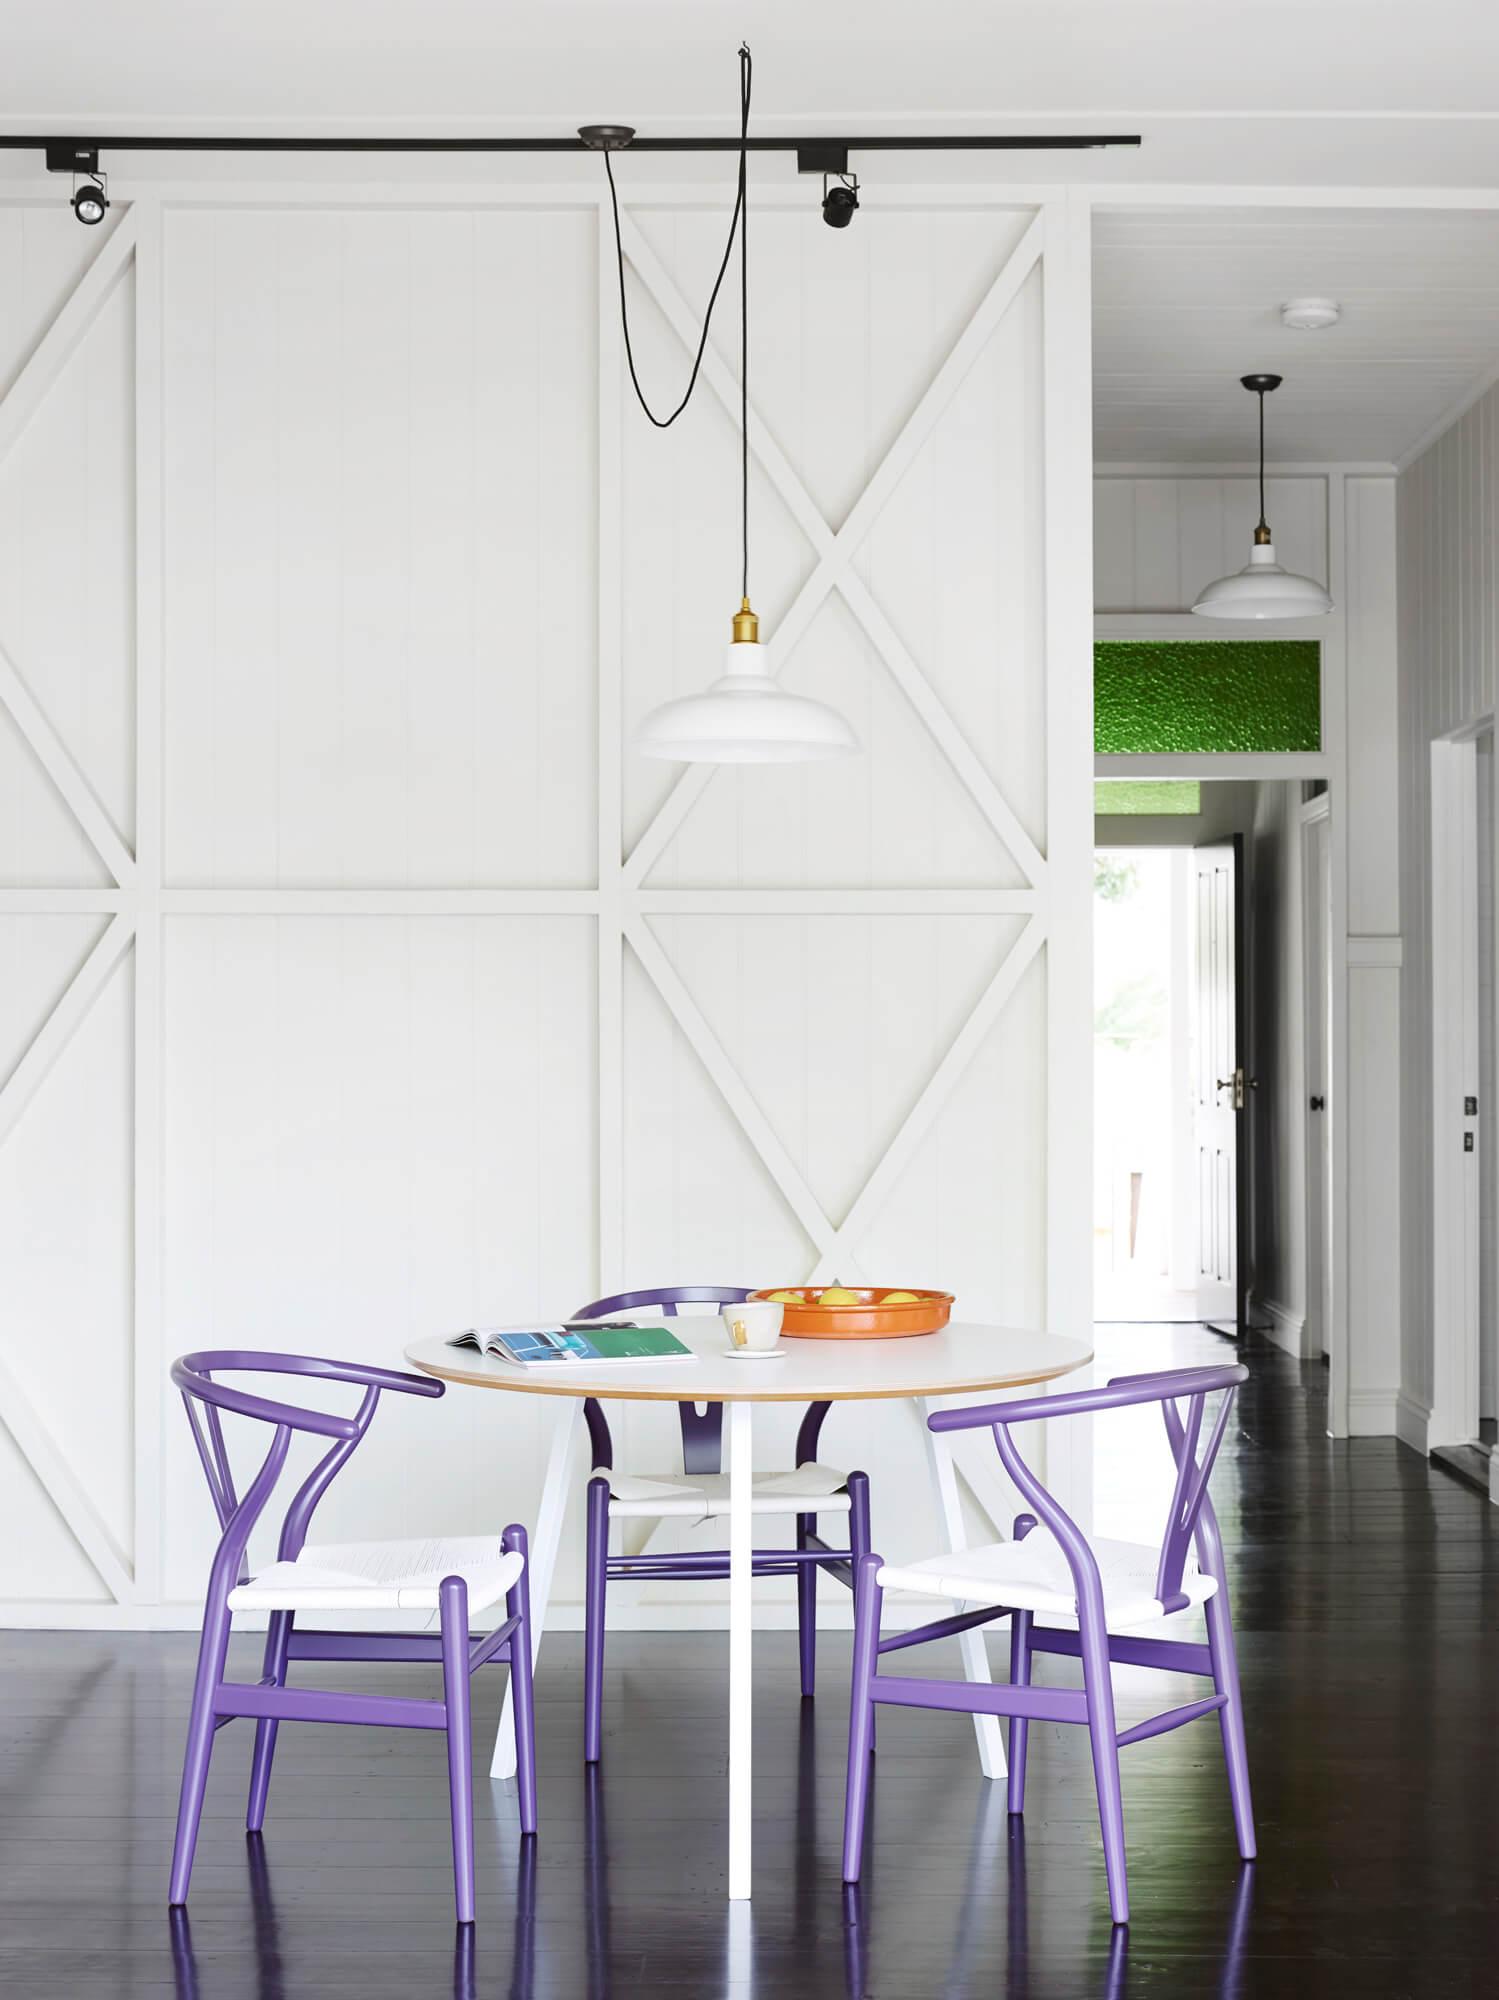 georgia-cannon-interior-designer-brisbane-project-m2-house-017094.jpg